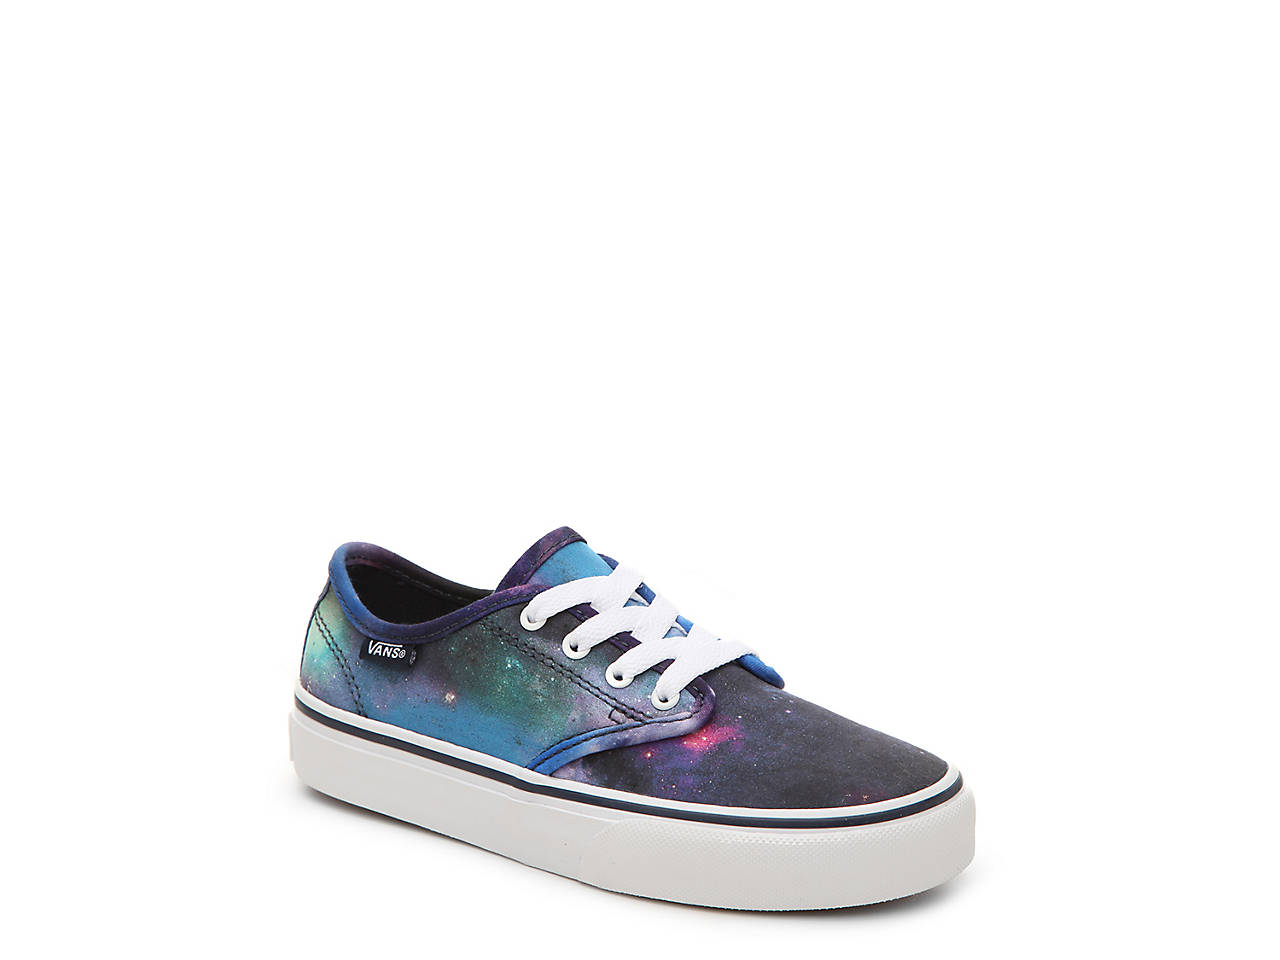 11c6eac454 Vans Camden Cosmic Galaxy Toddler   Youth Sneaker Kids Shoes